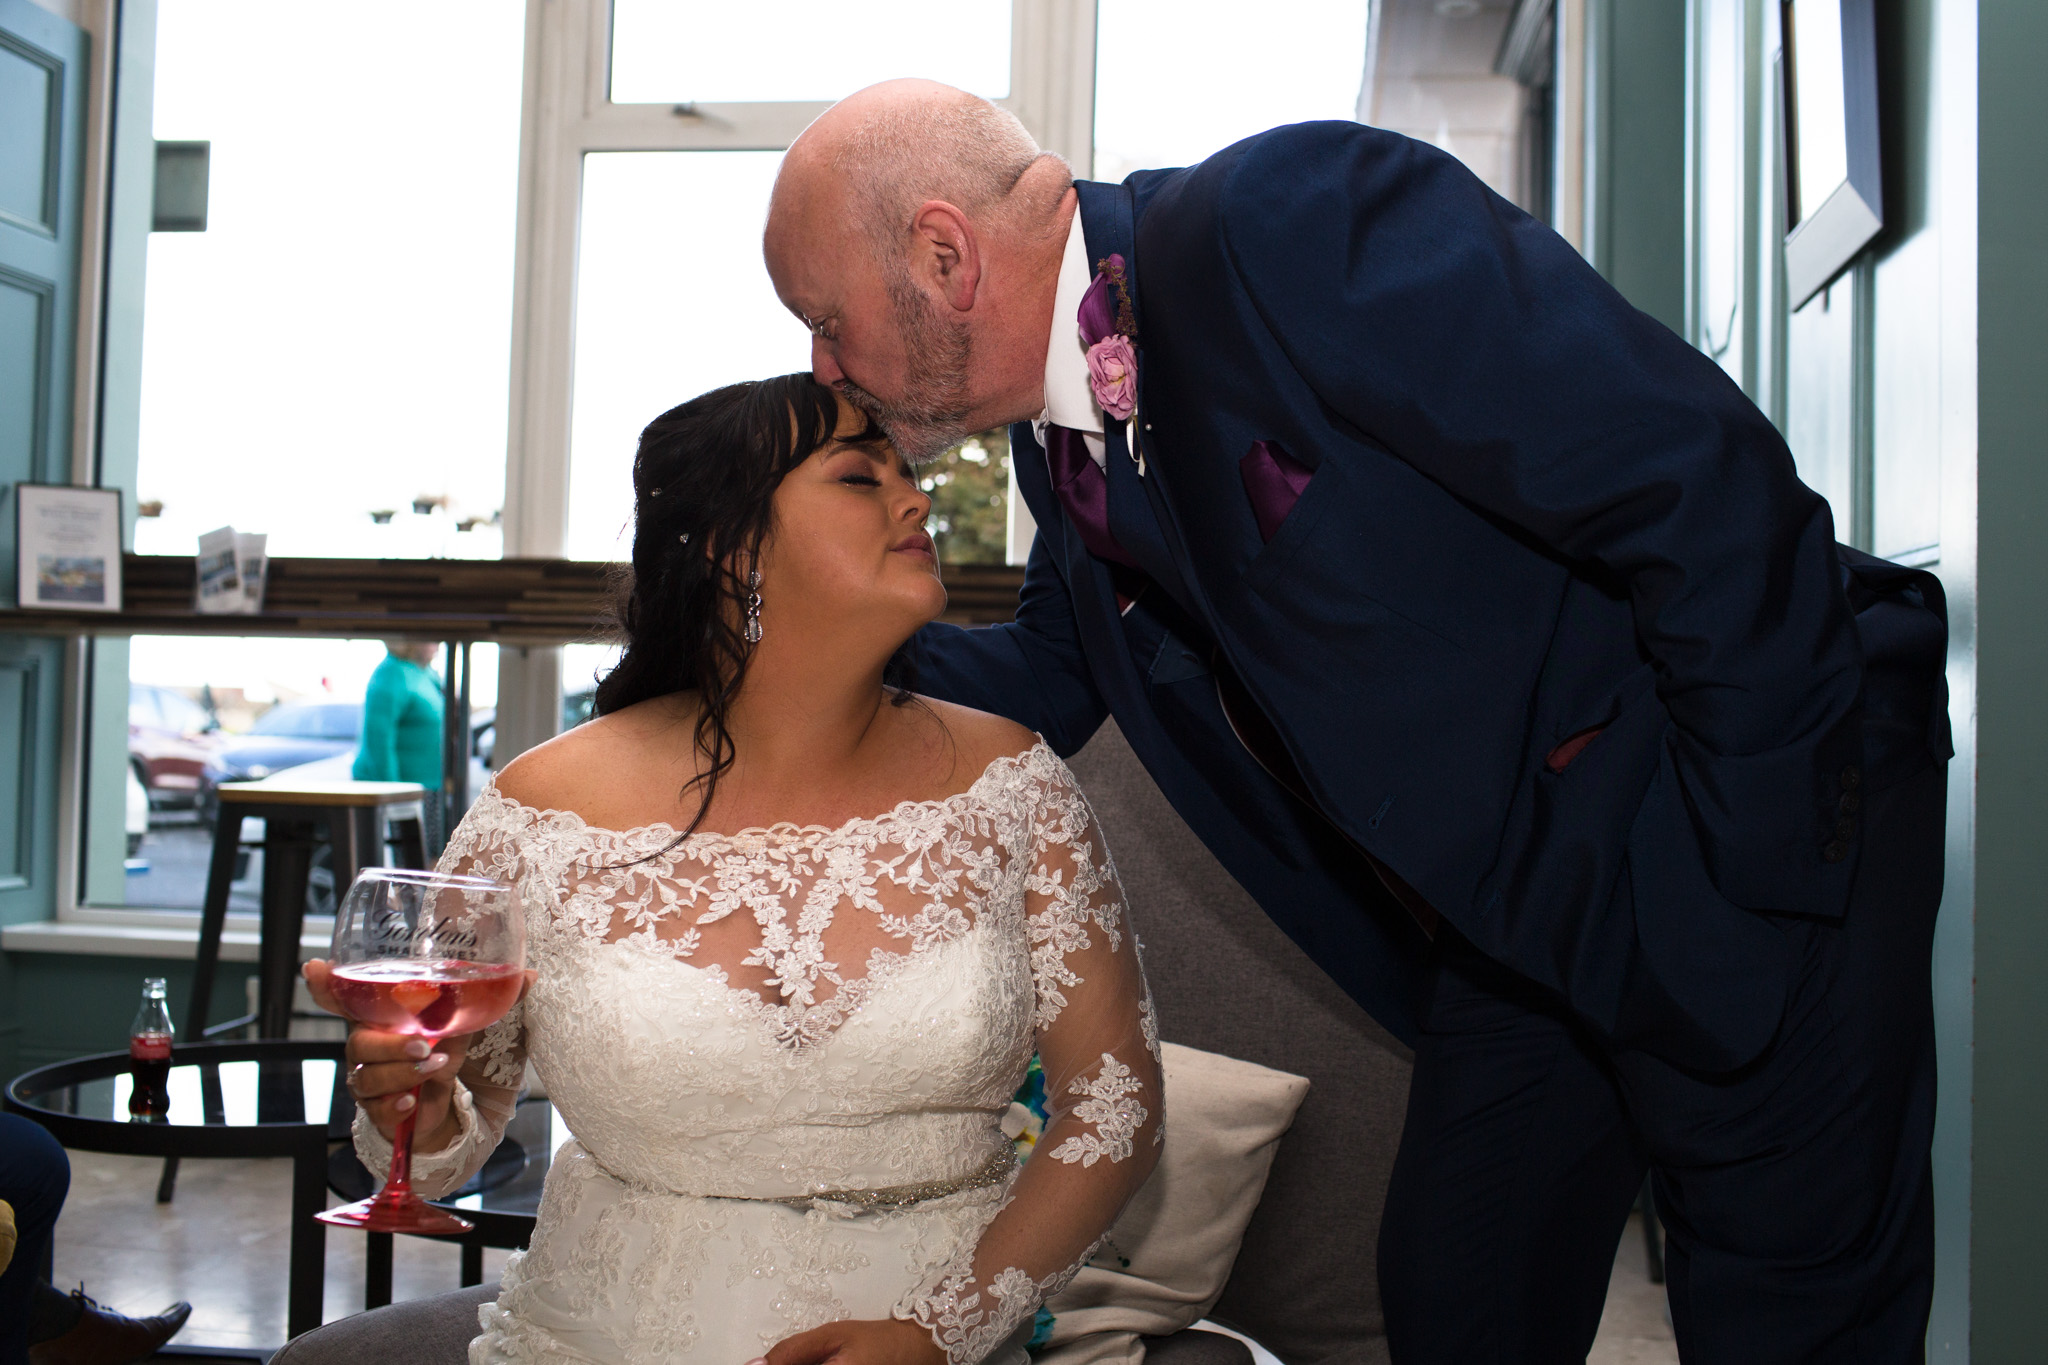 Mark_Barnes_Northern_Ireland_Wedding_Photography_Marine_hotel_ballycastle_Wedding_Photography_Janet&Darren-30.jpg